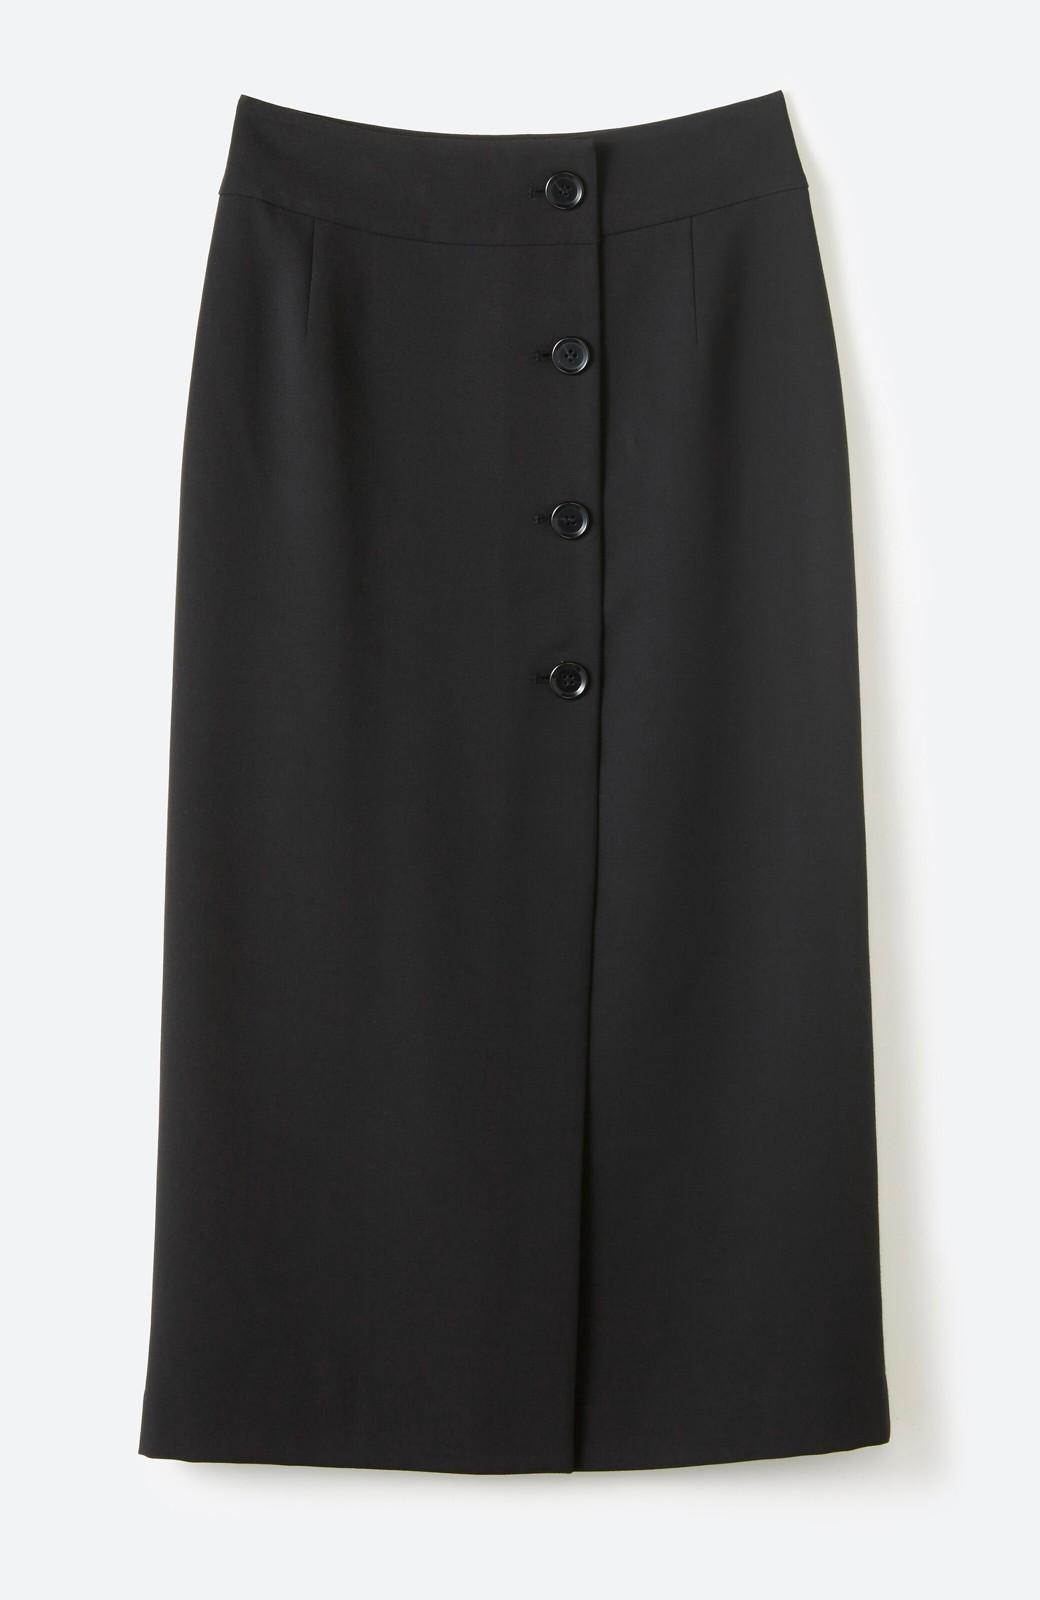 haco! はいてこそ見える実力、セミフォーマルにも使えるオトナのタイトスカート by MAKORI <ブラック>の商品写真2